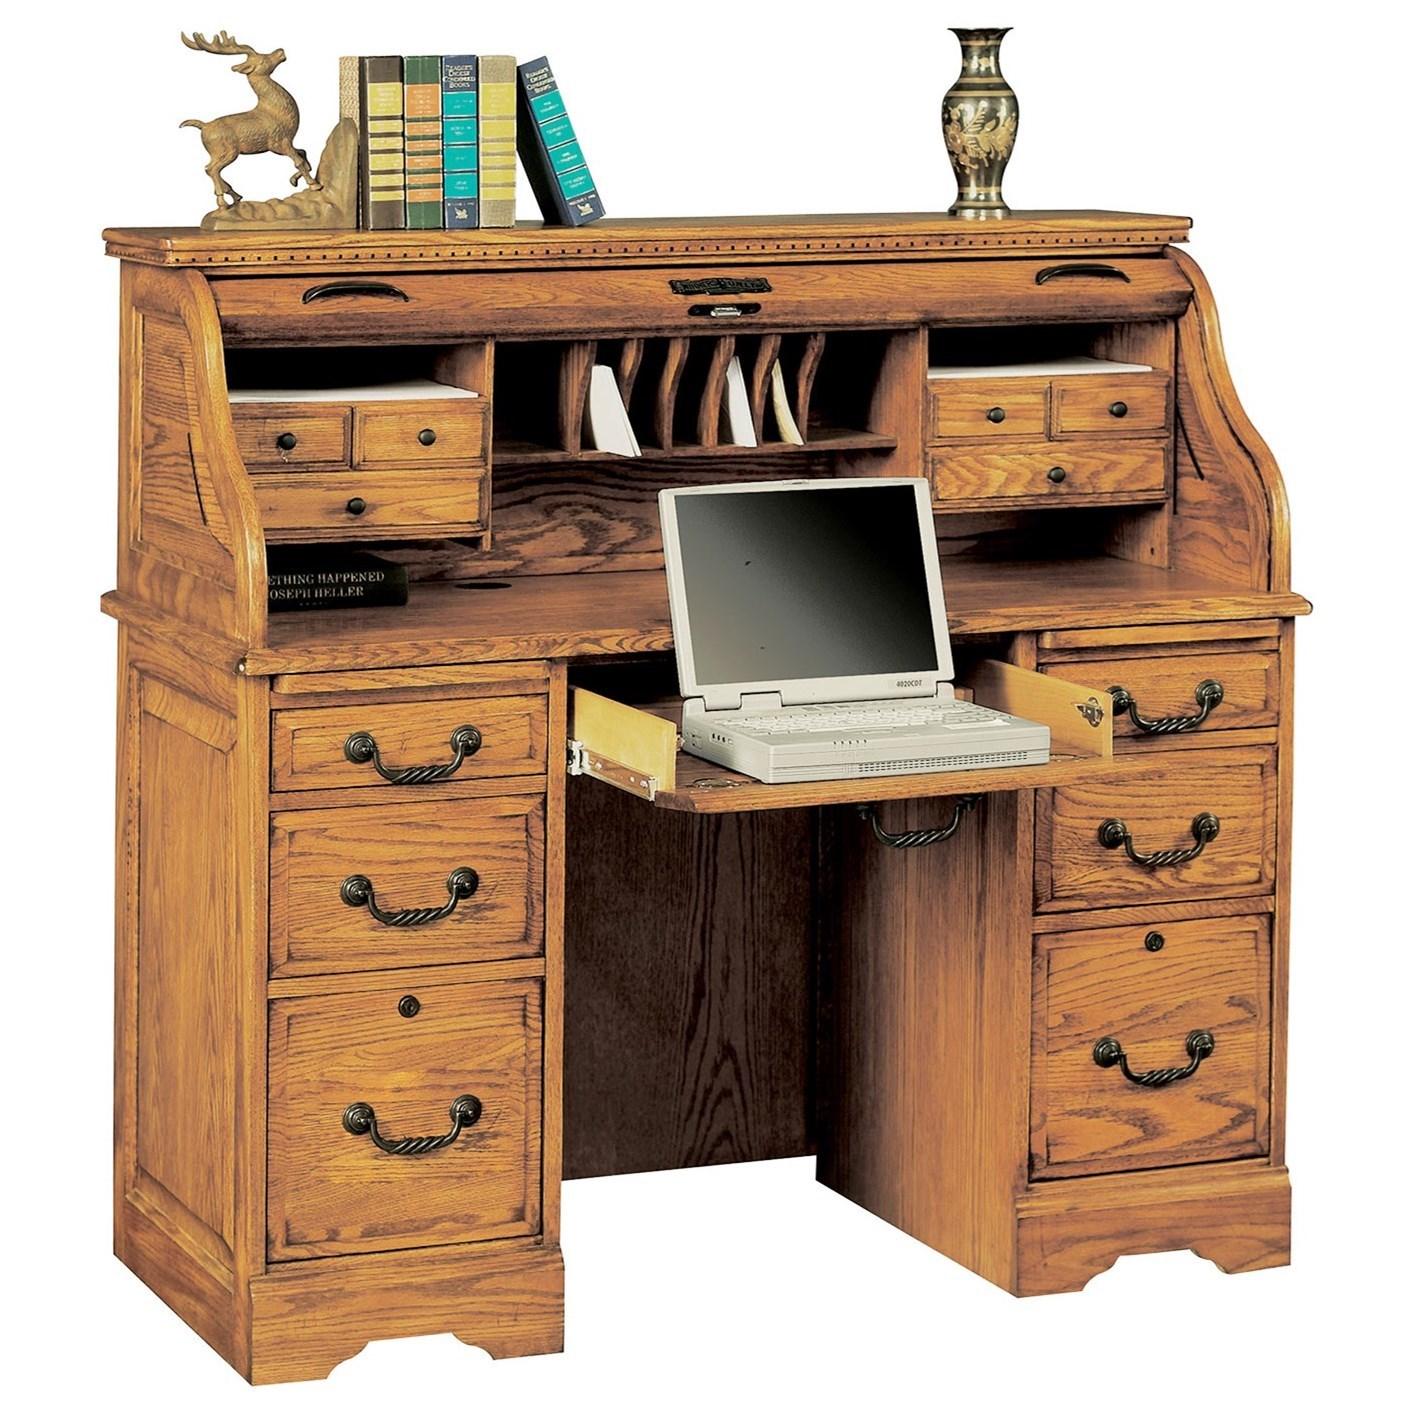 "Heritage 49"" Roll Top Desk"